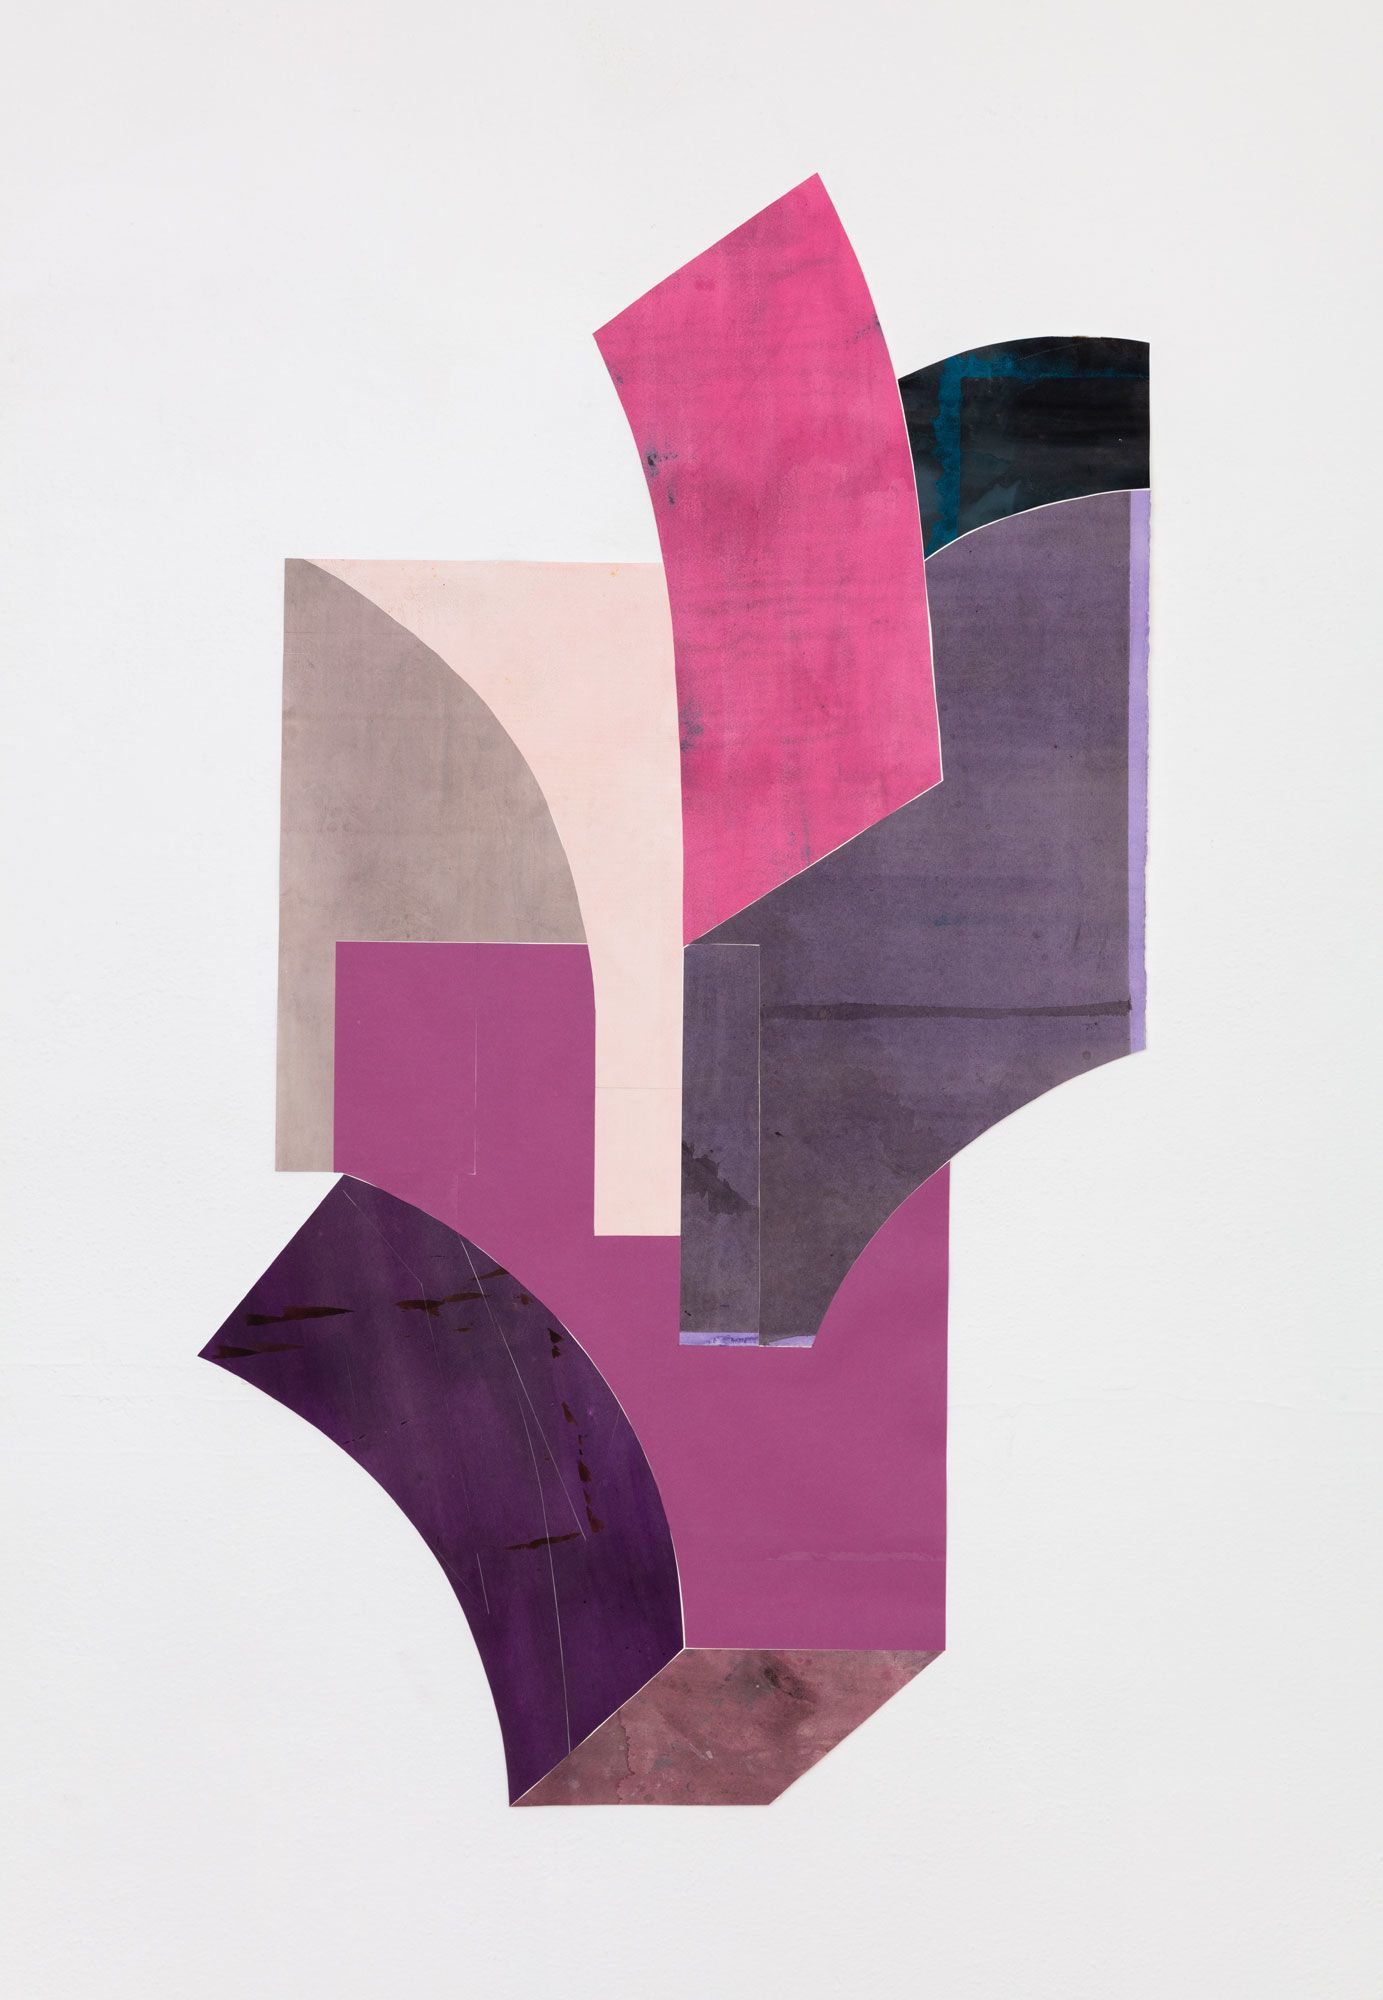 Untitled (floor paper, 2 pinks, 4 purples)